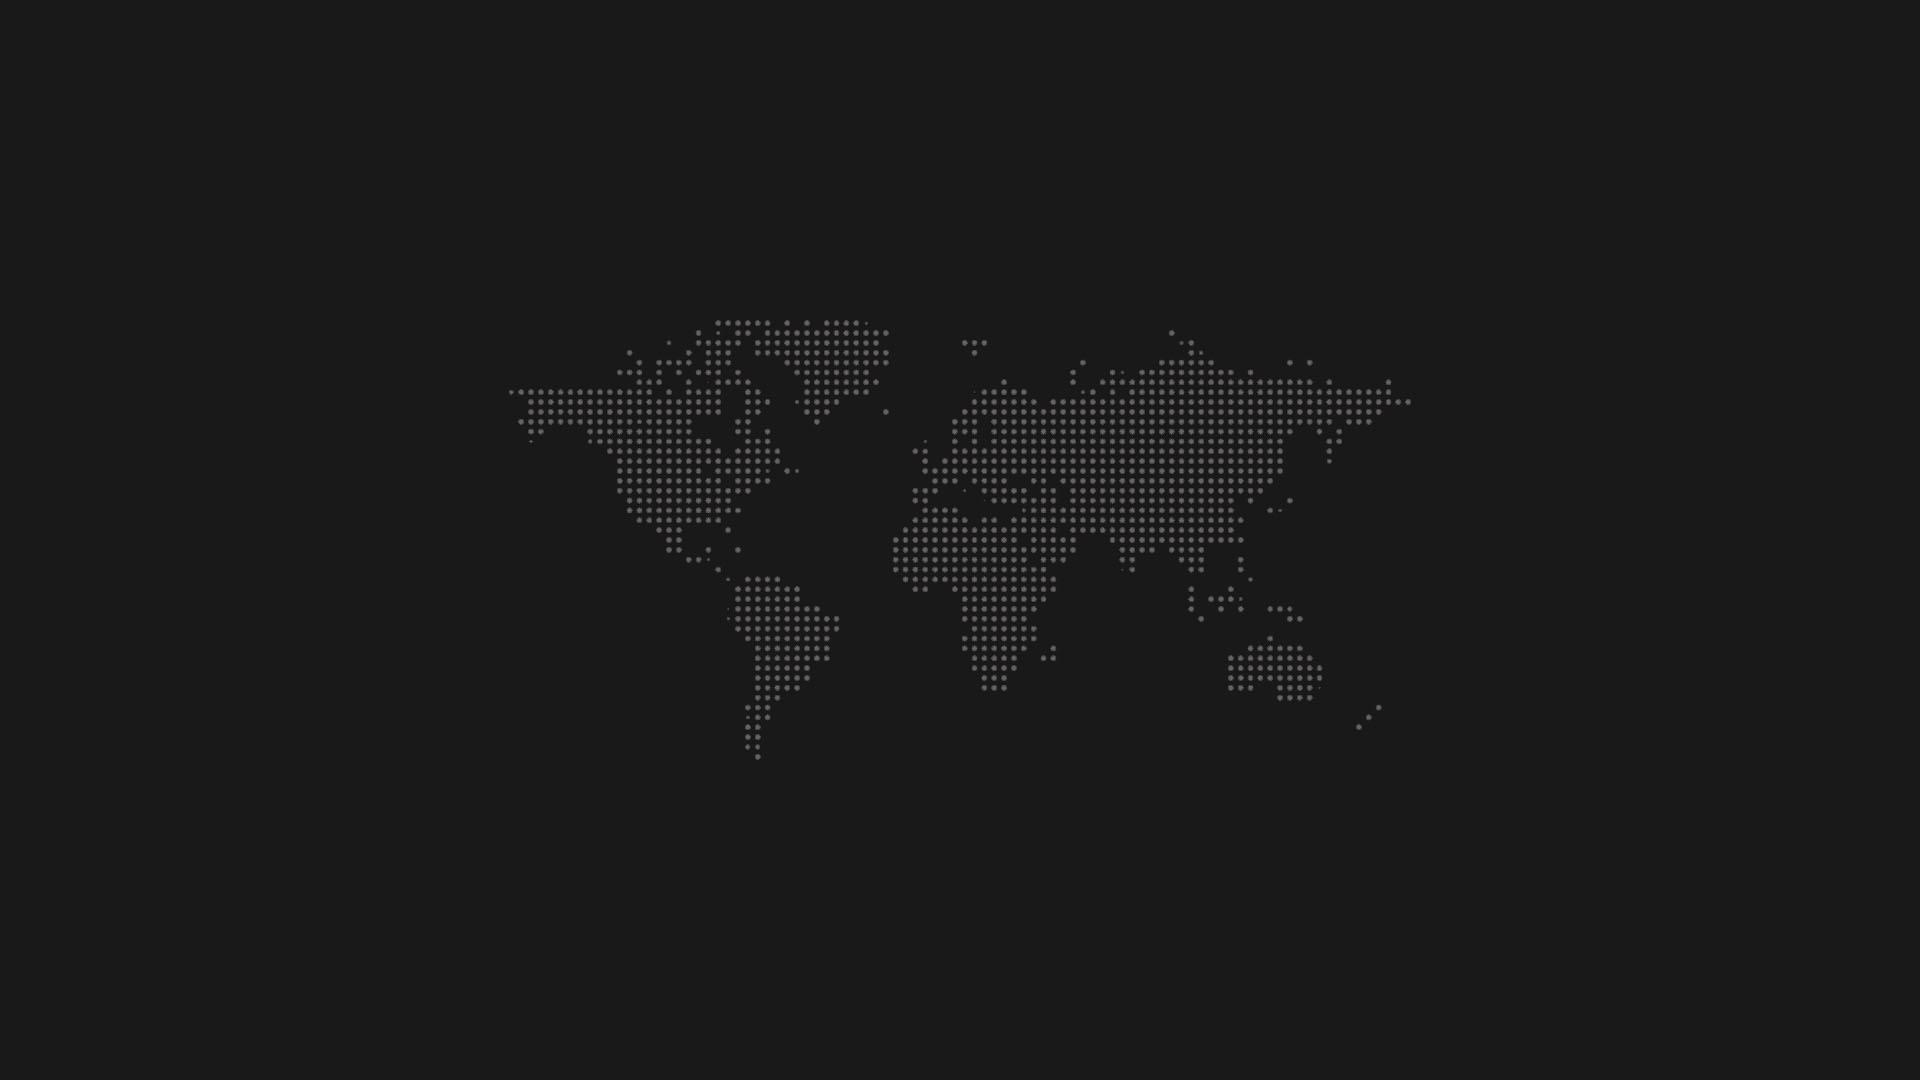 Dark World Map Wallpaper 4694 4941 Hd Wallpapersjpg 1920x1080